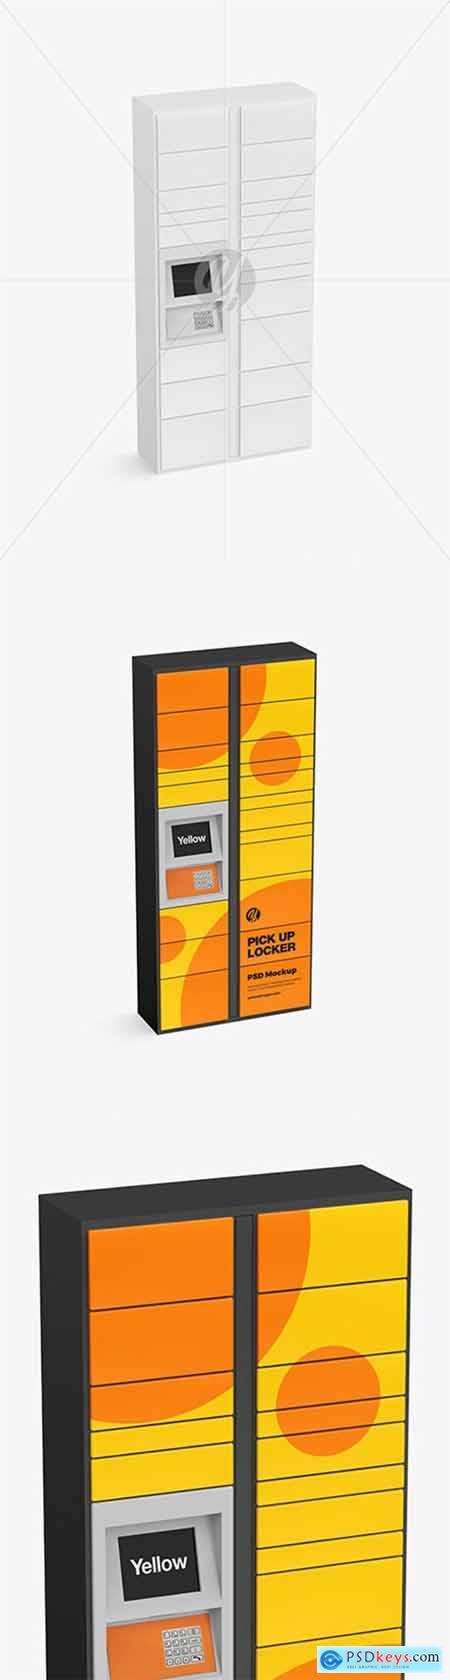 Pick Up Locker Mockup 79736